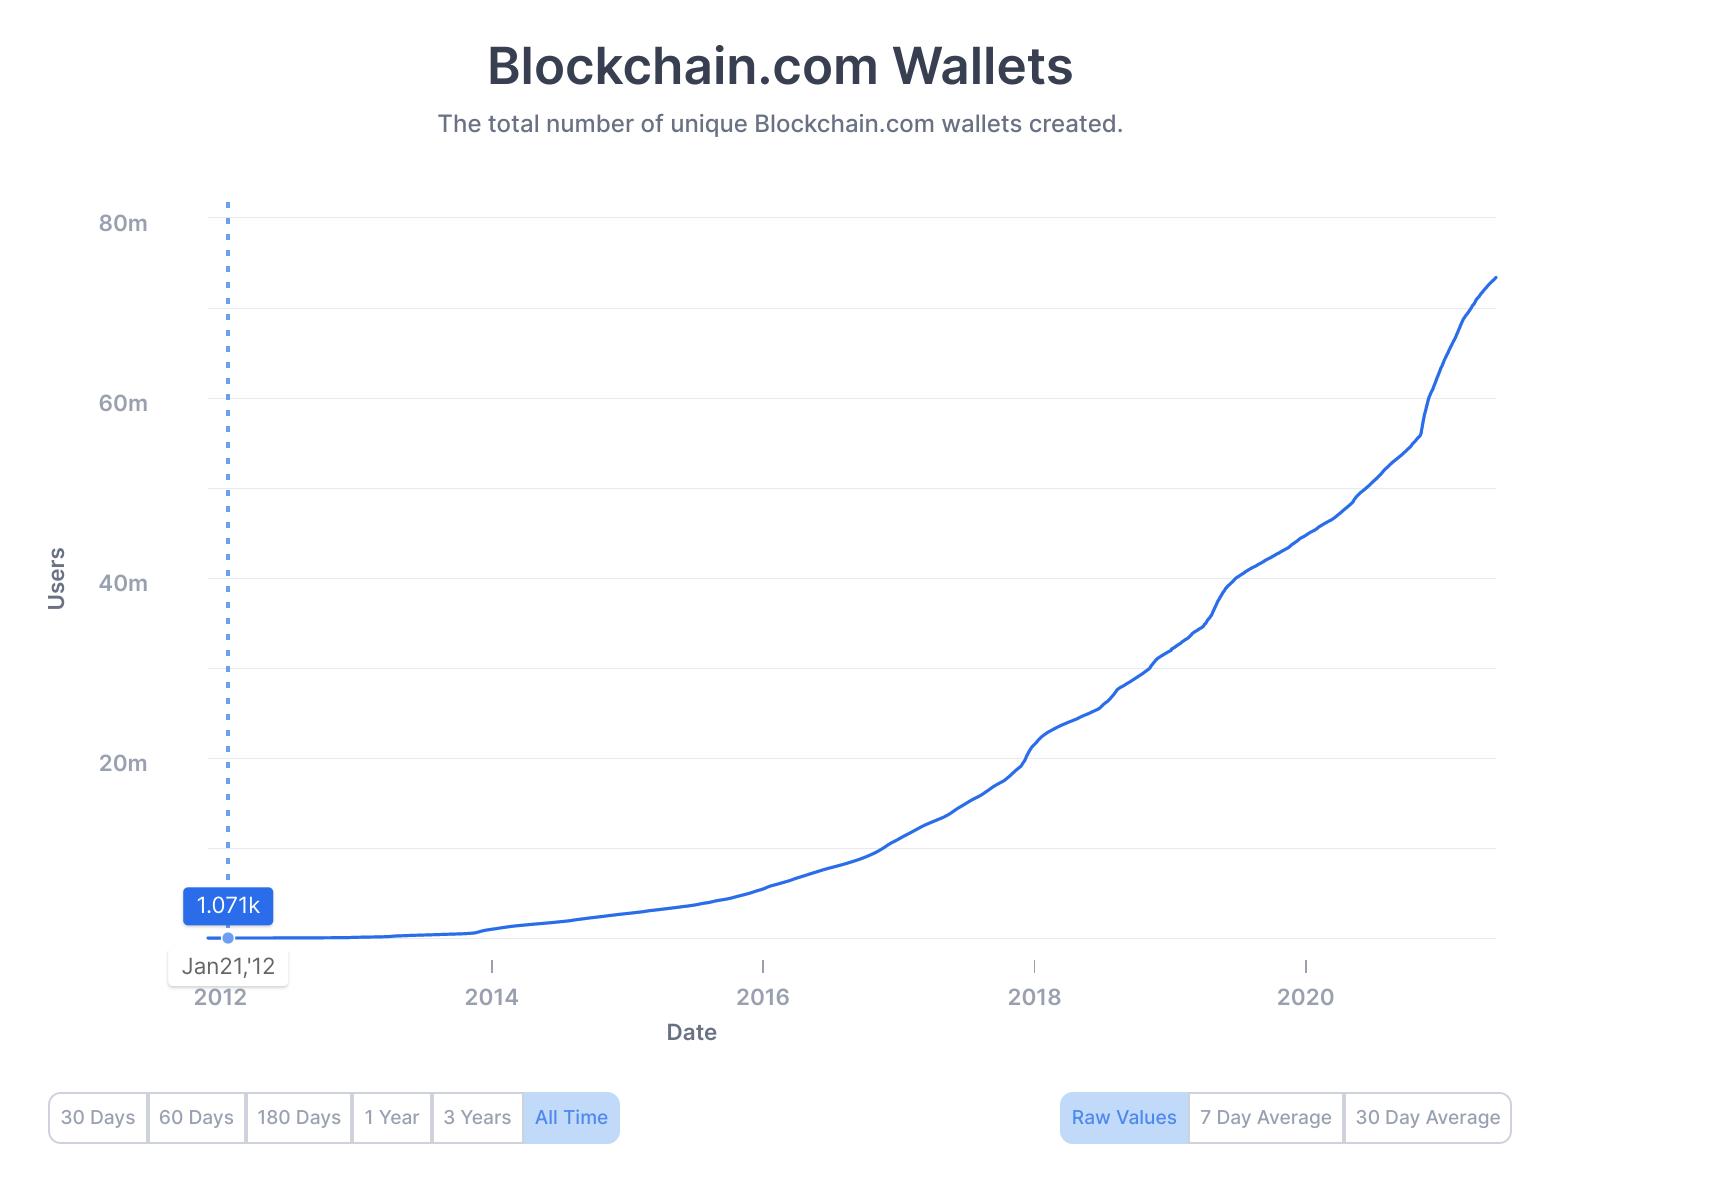 blockchain.com wallets growth chart